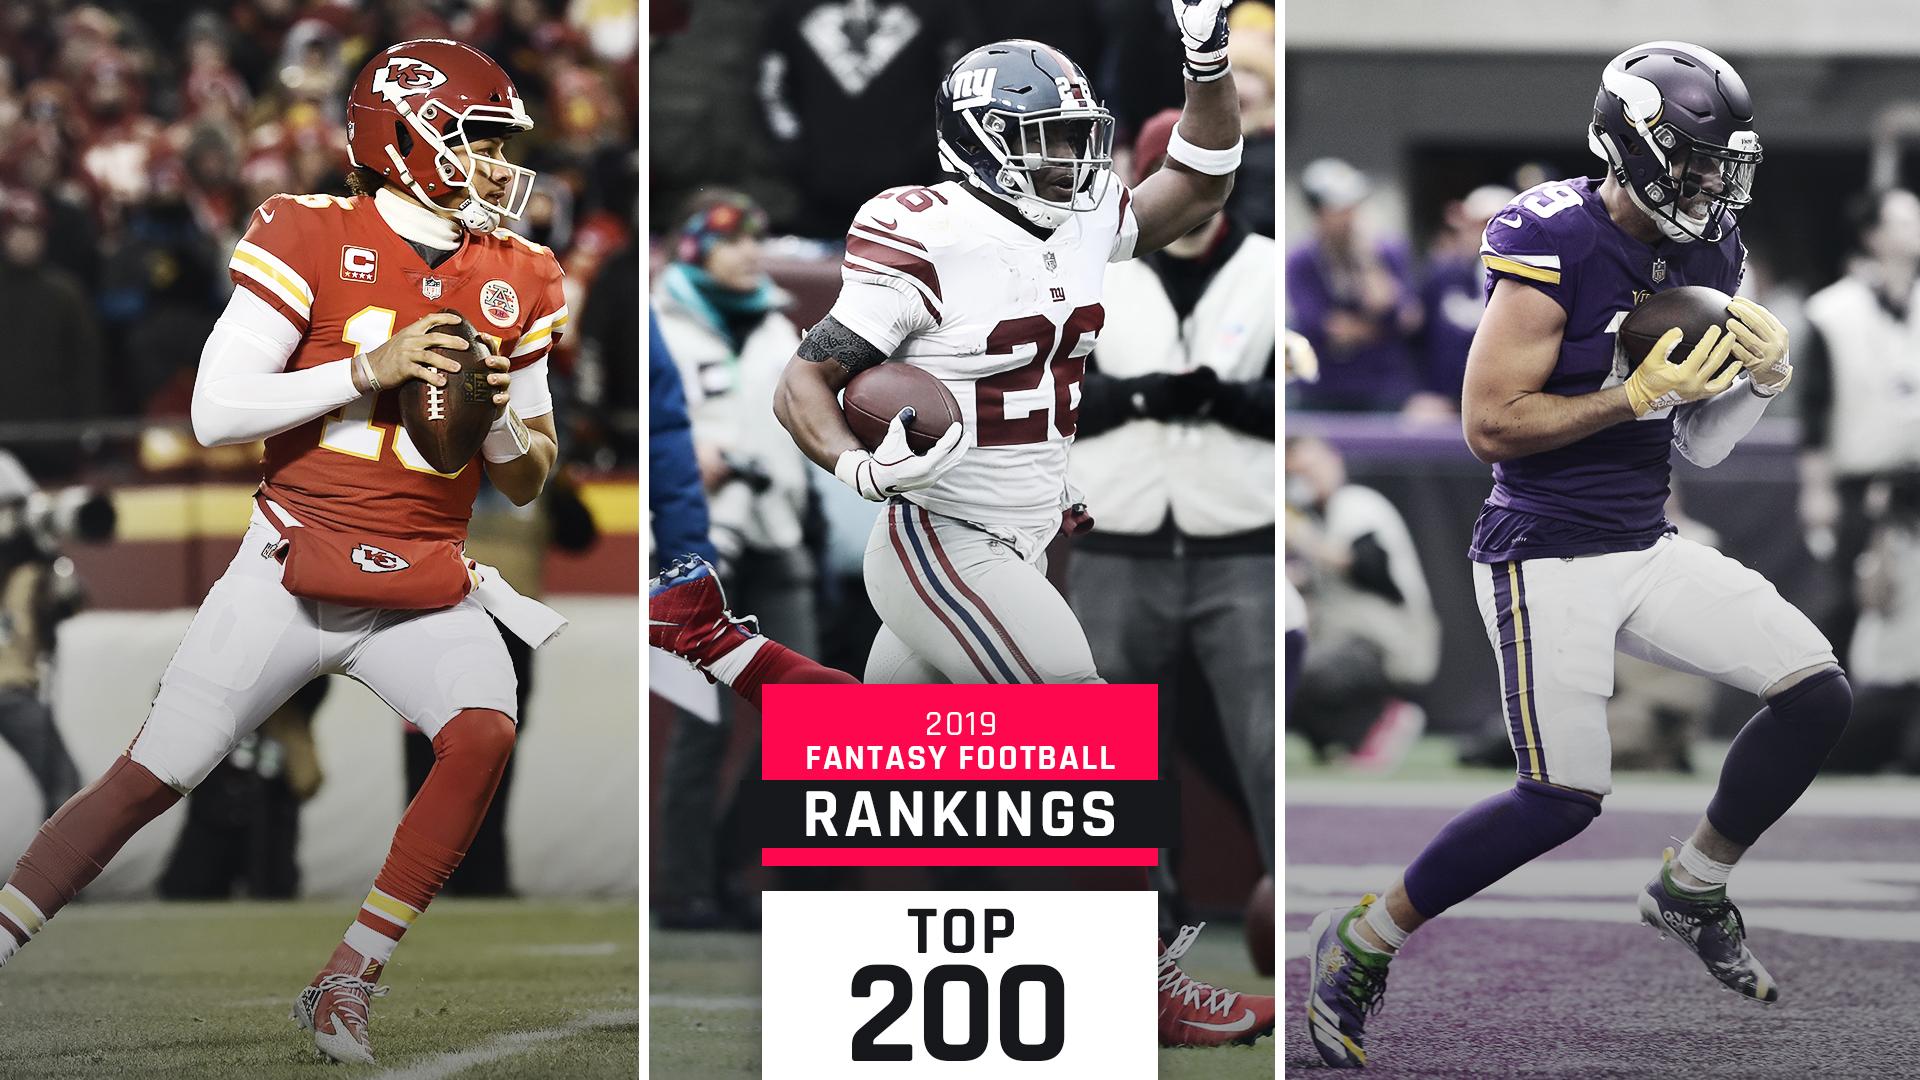 Best Picks For Fantasy Football 2019 2019 Fantasy Football Rankings: Top 200 Cheat Sheet | Sporting News